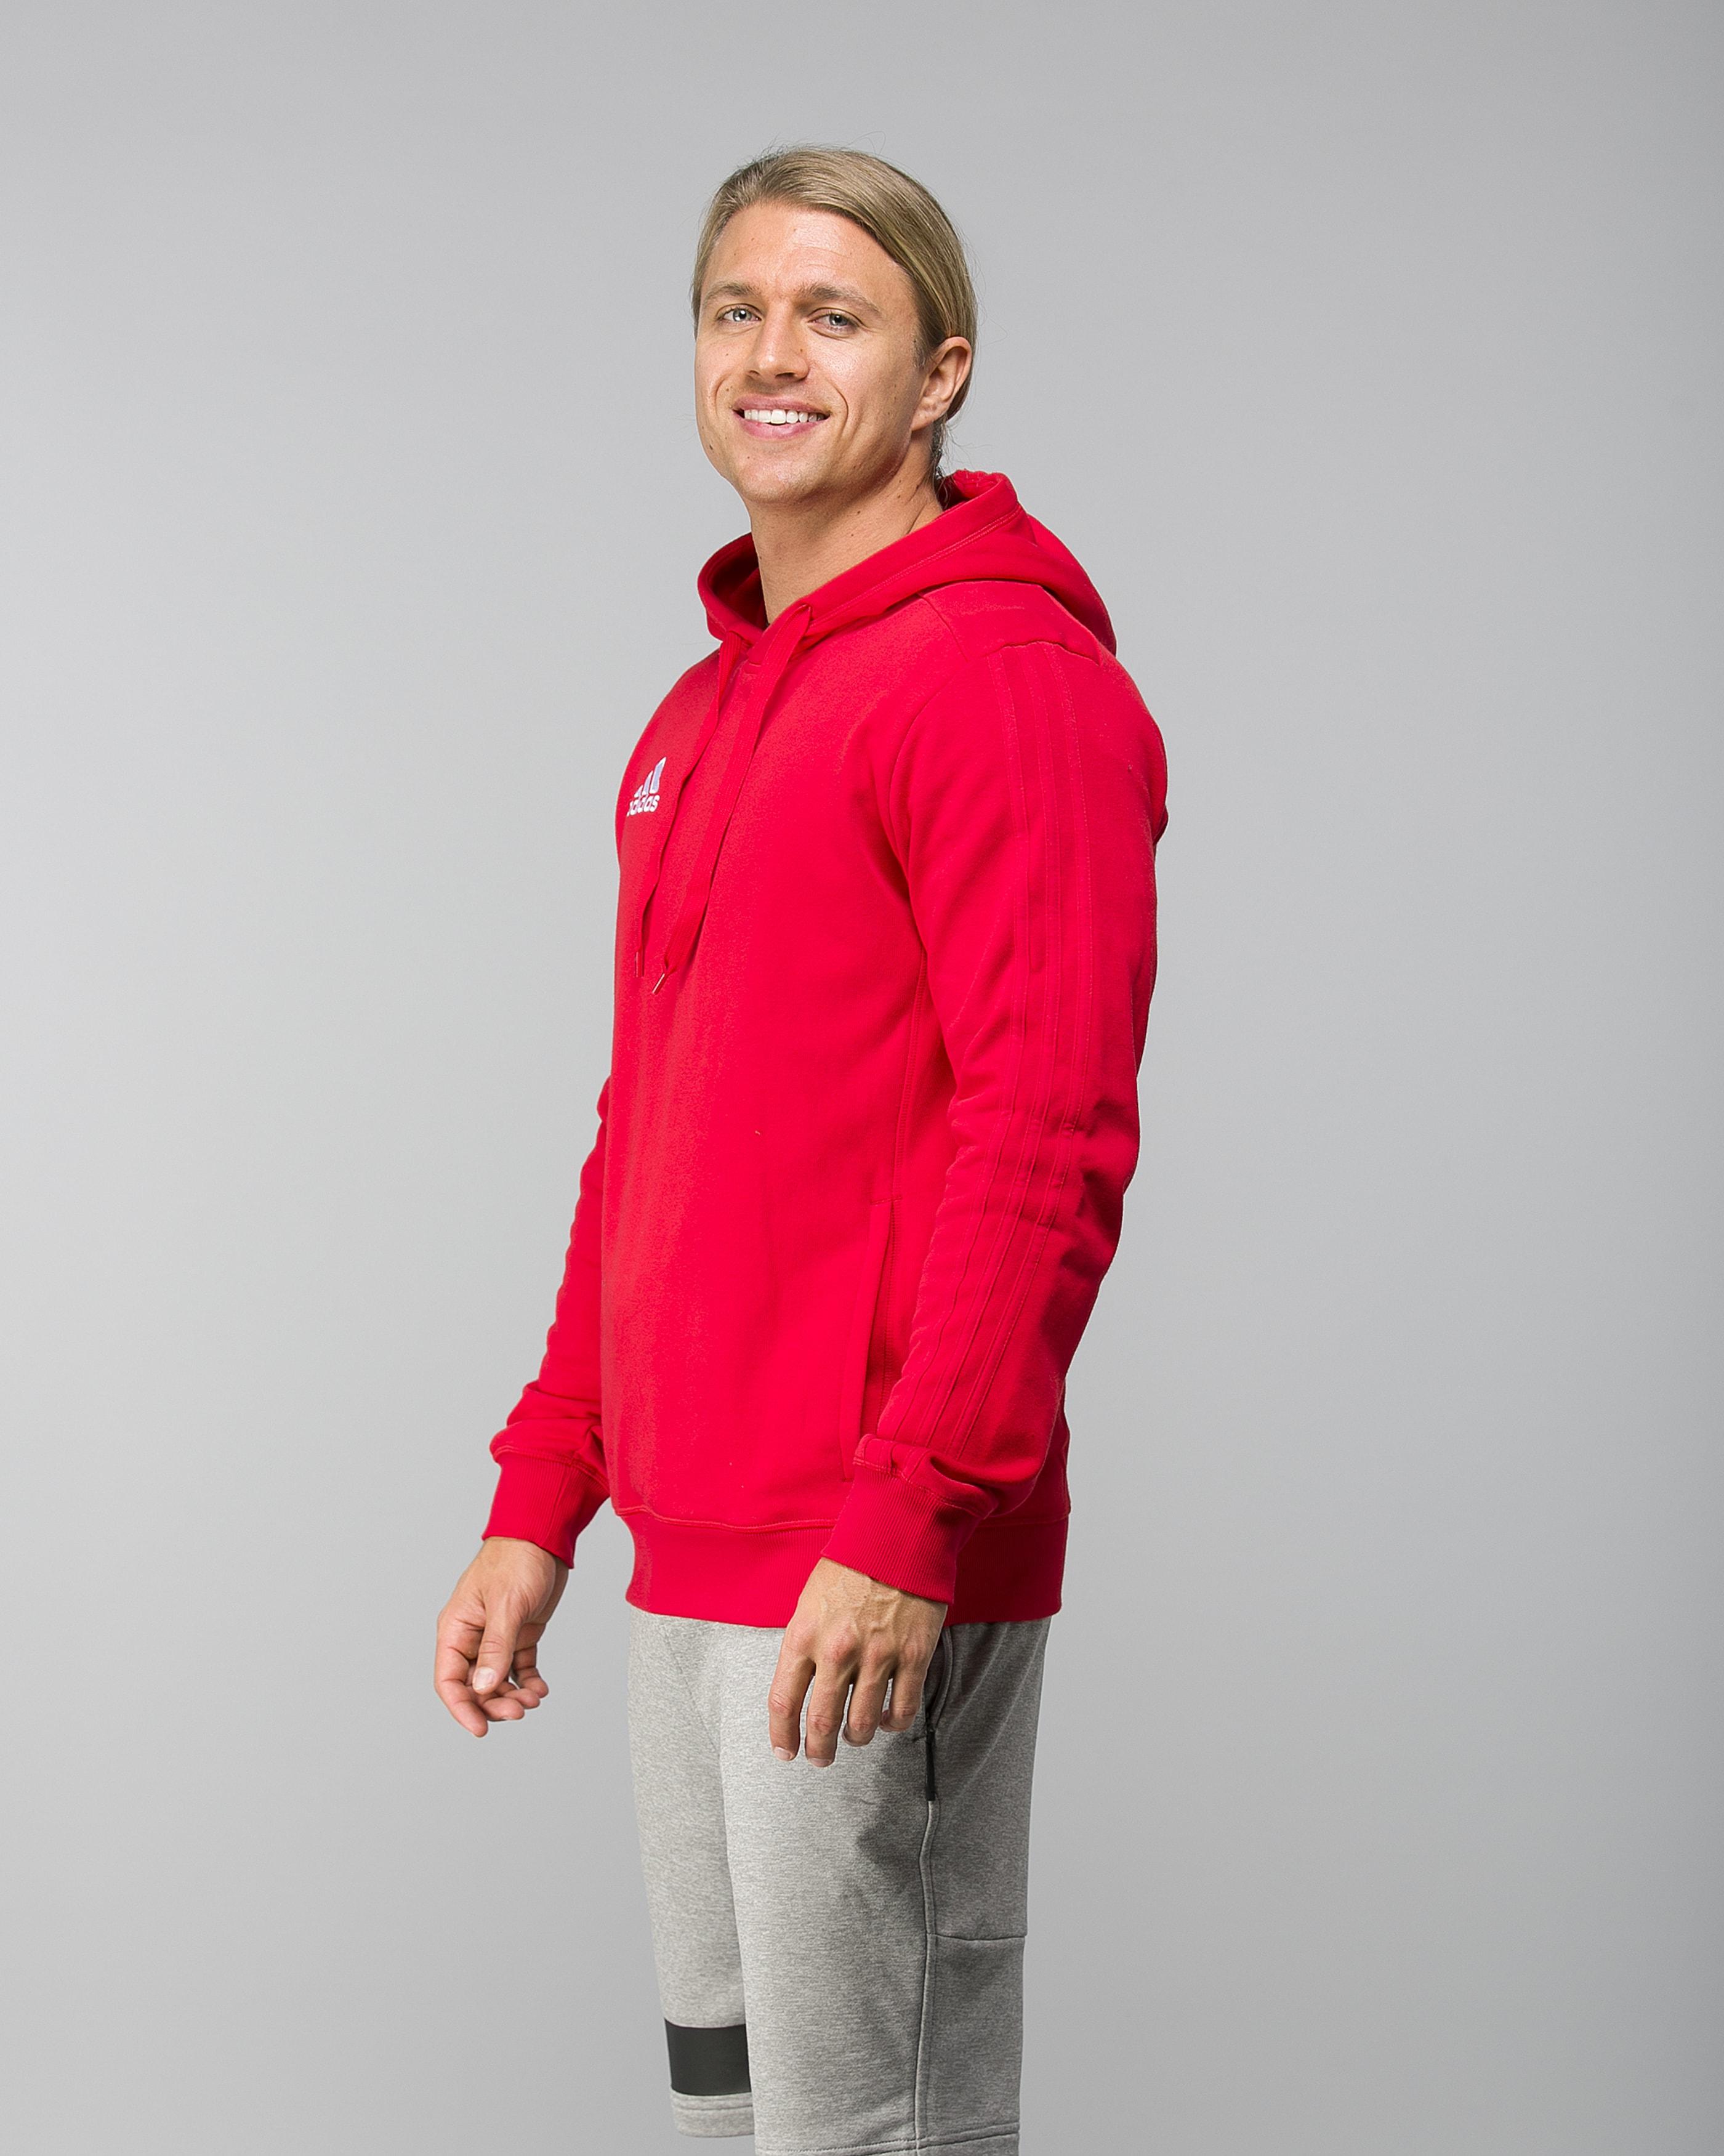 Adidas Tiro17 Hoody Scarlet RedWhite Tights.no